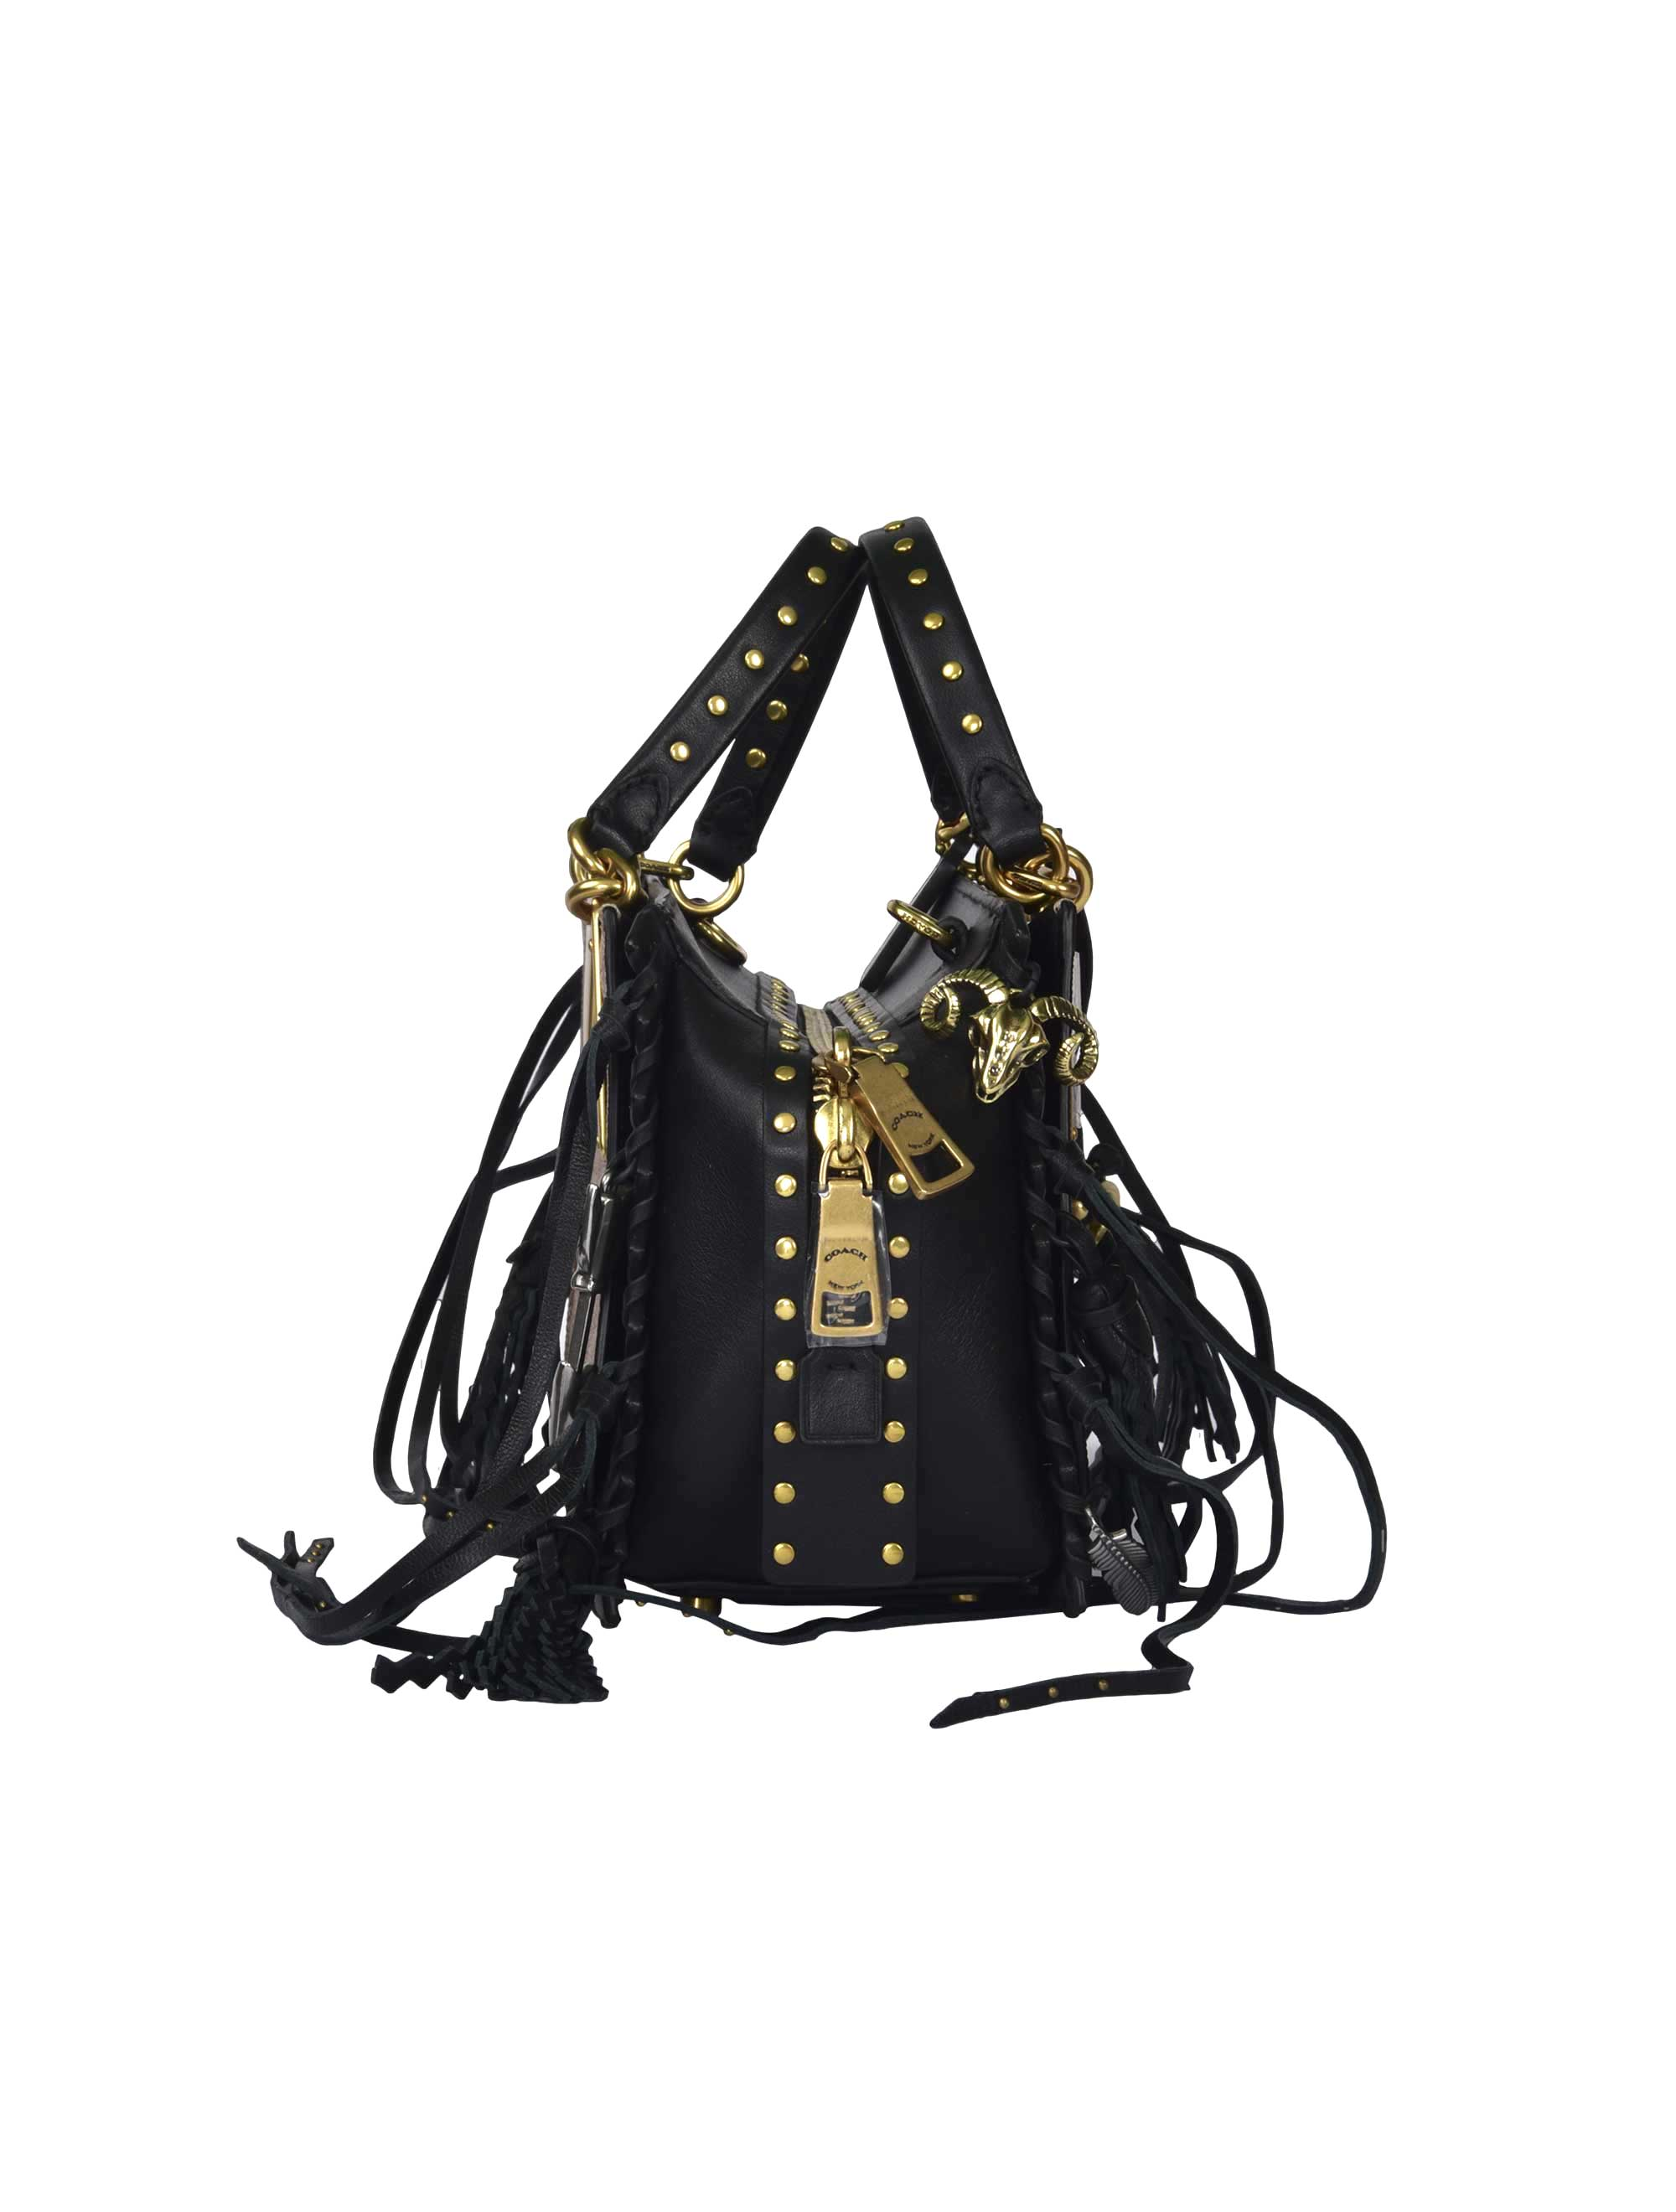 Mimma Ninni – Luxury and Fashion Shopping. Coach Fringe Detail Mini ... 5848bc8c80366